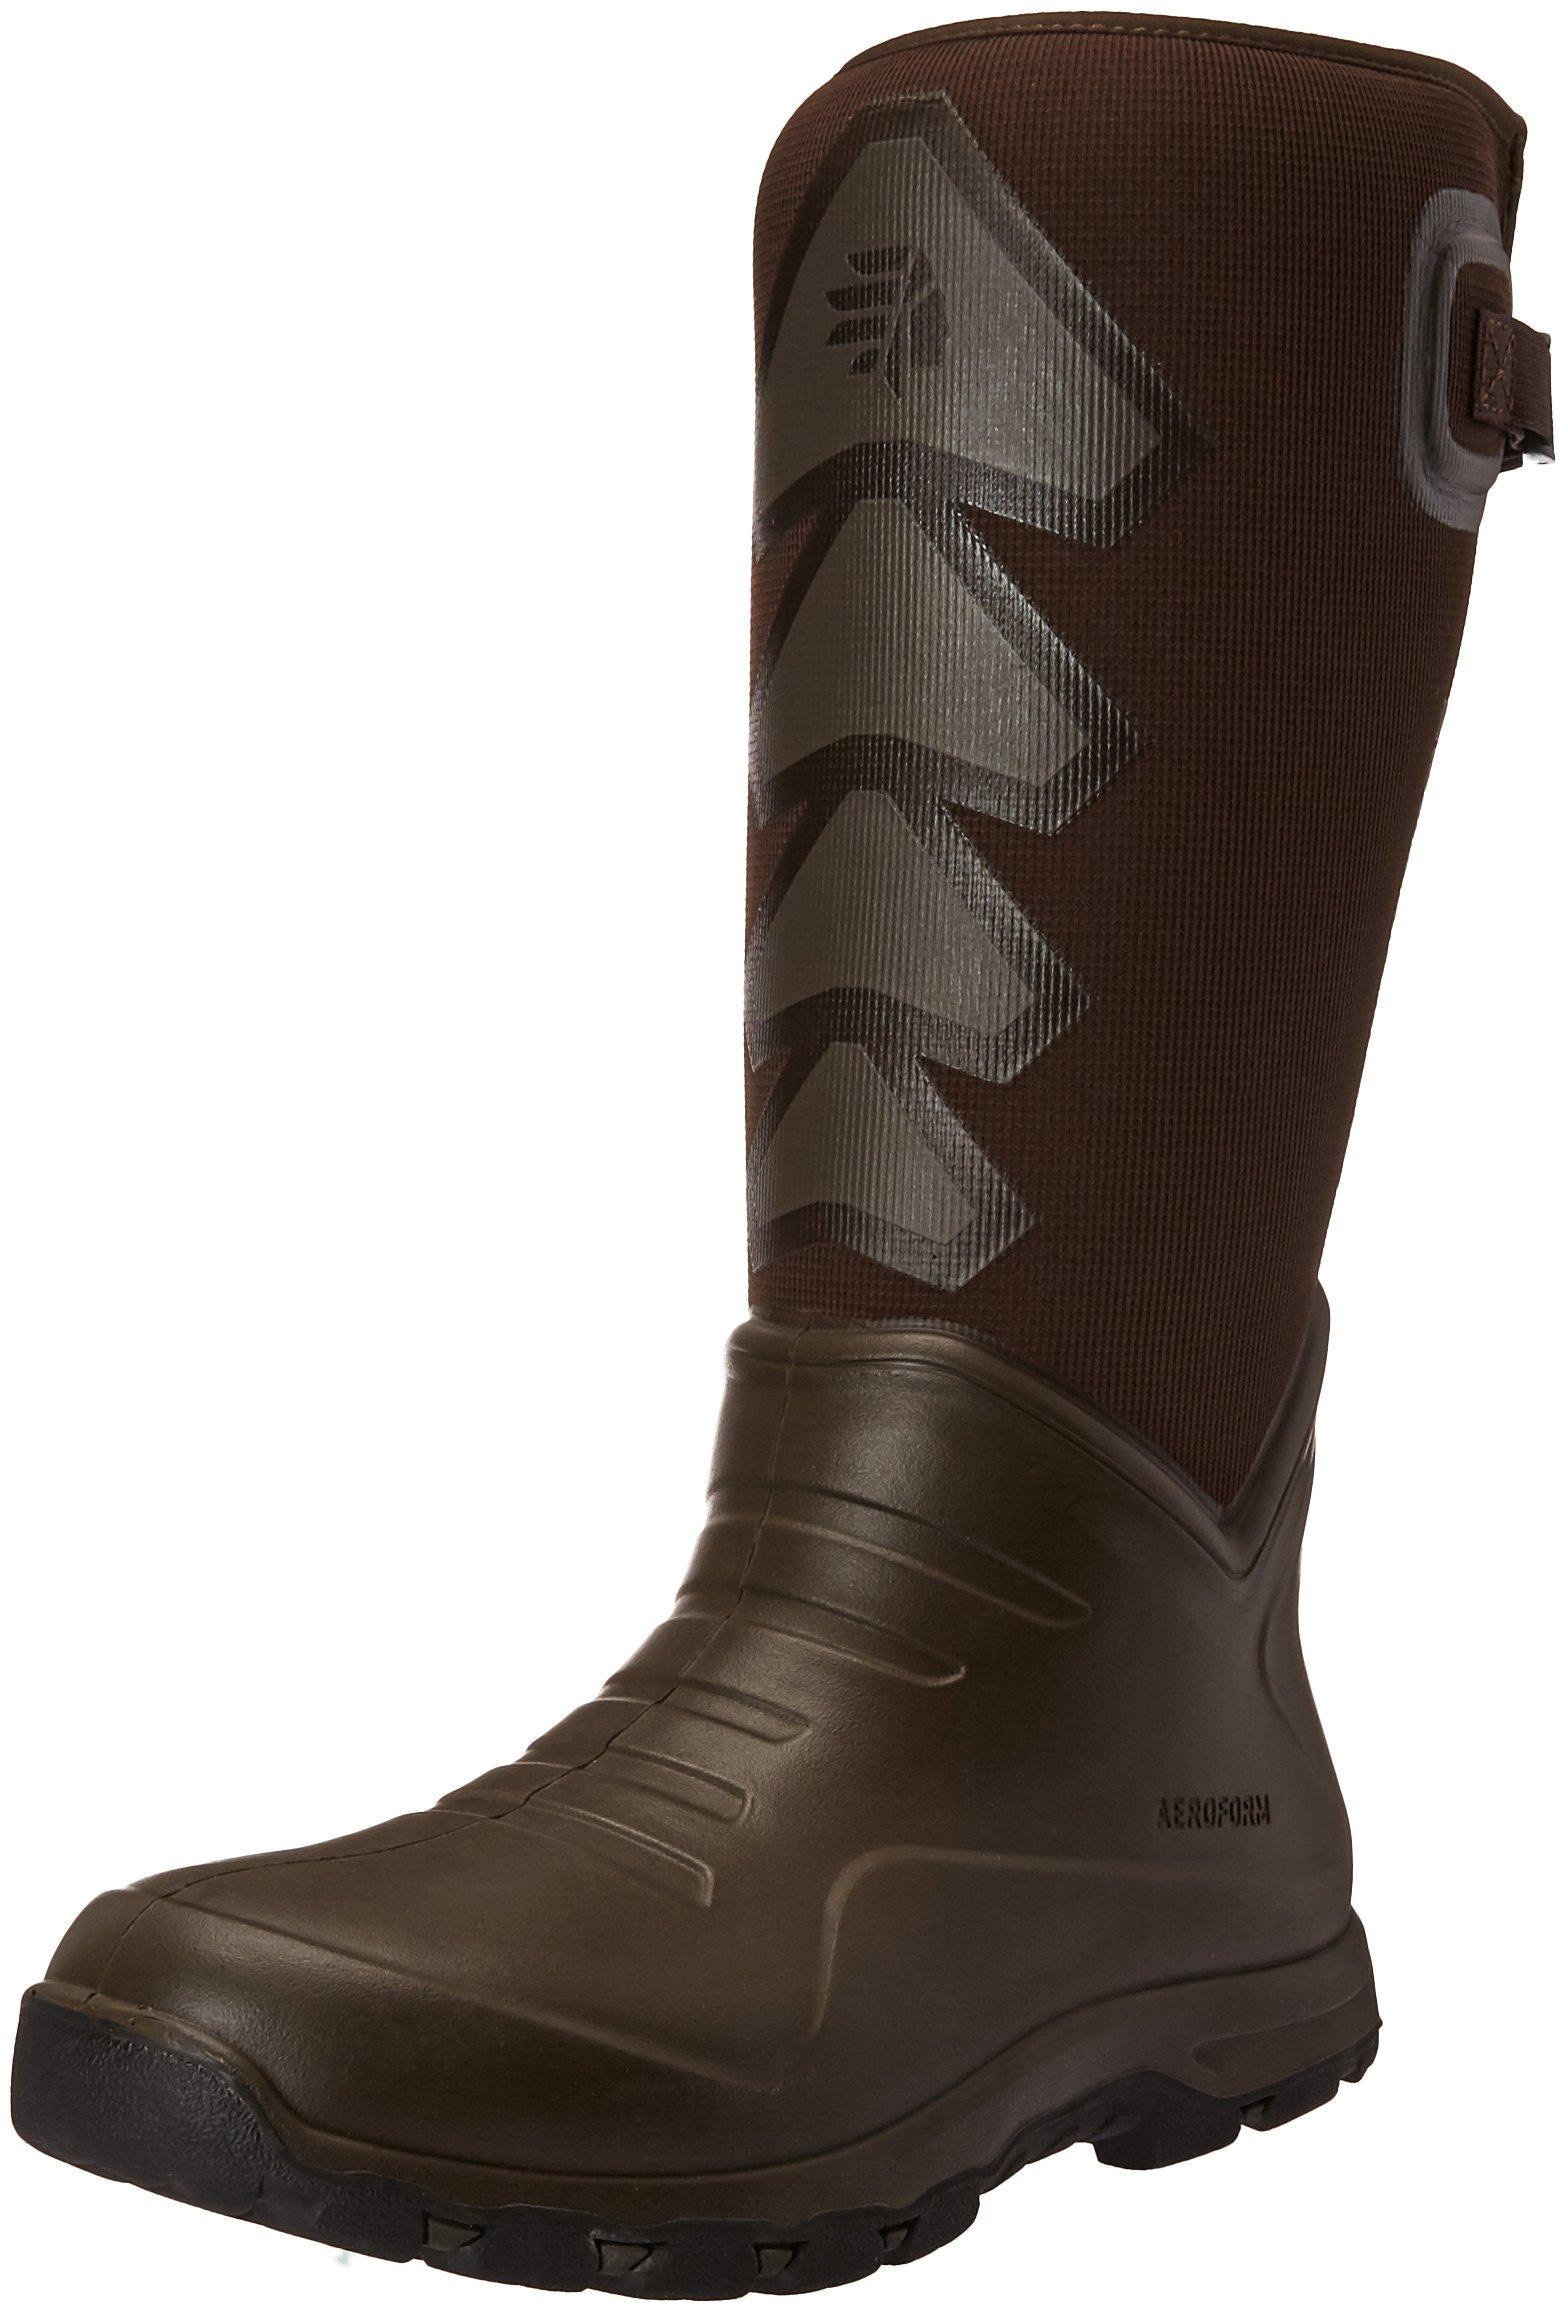 Lacrosse Men's Aerohead Sport 16'' 7.0MM Hunting Shoes, Brown, 7 M US by Lacrosse